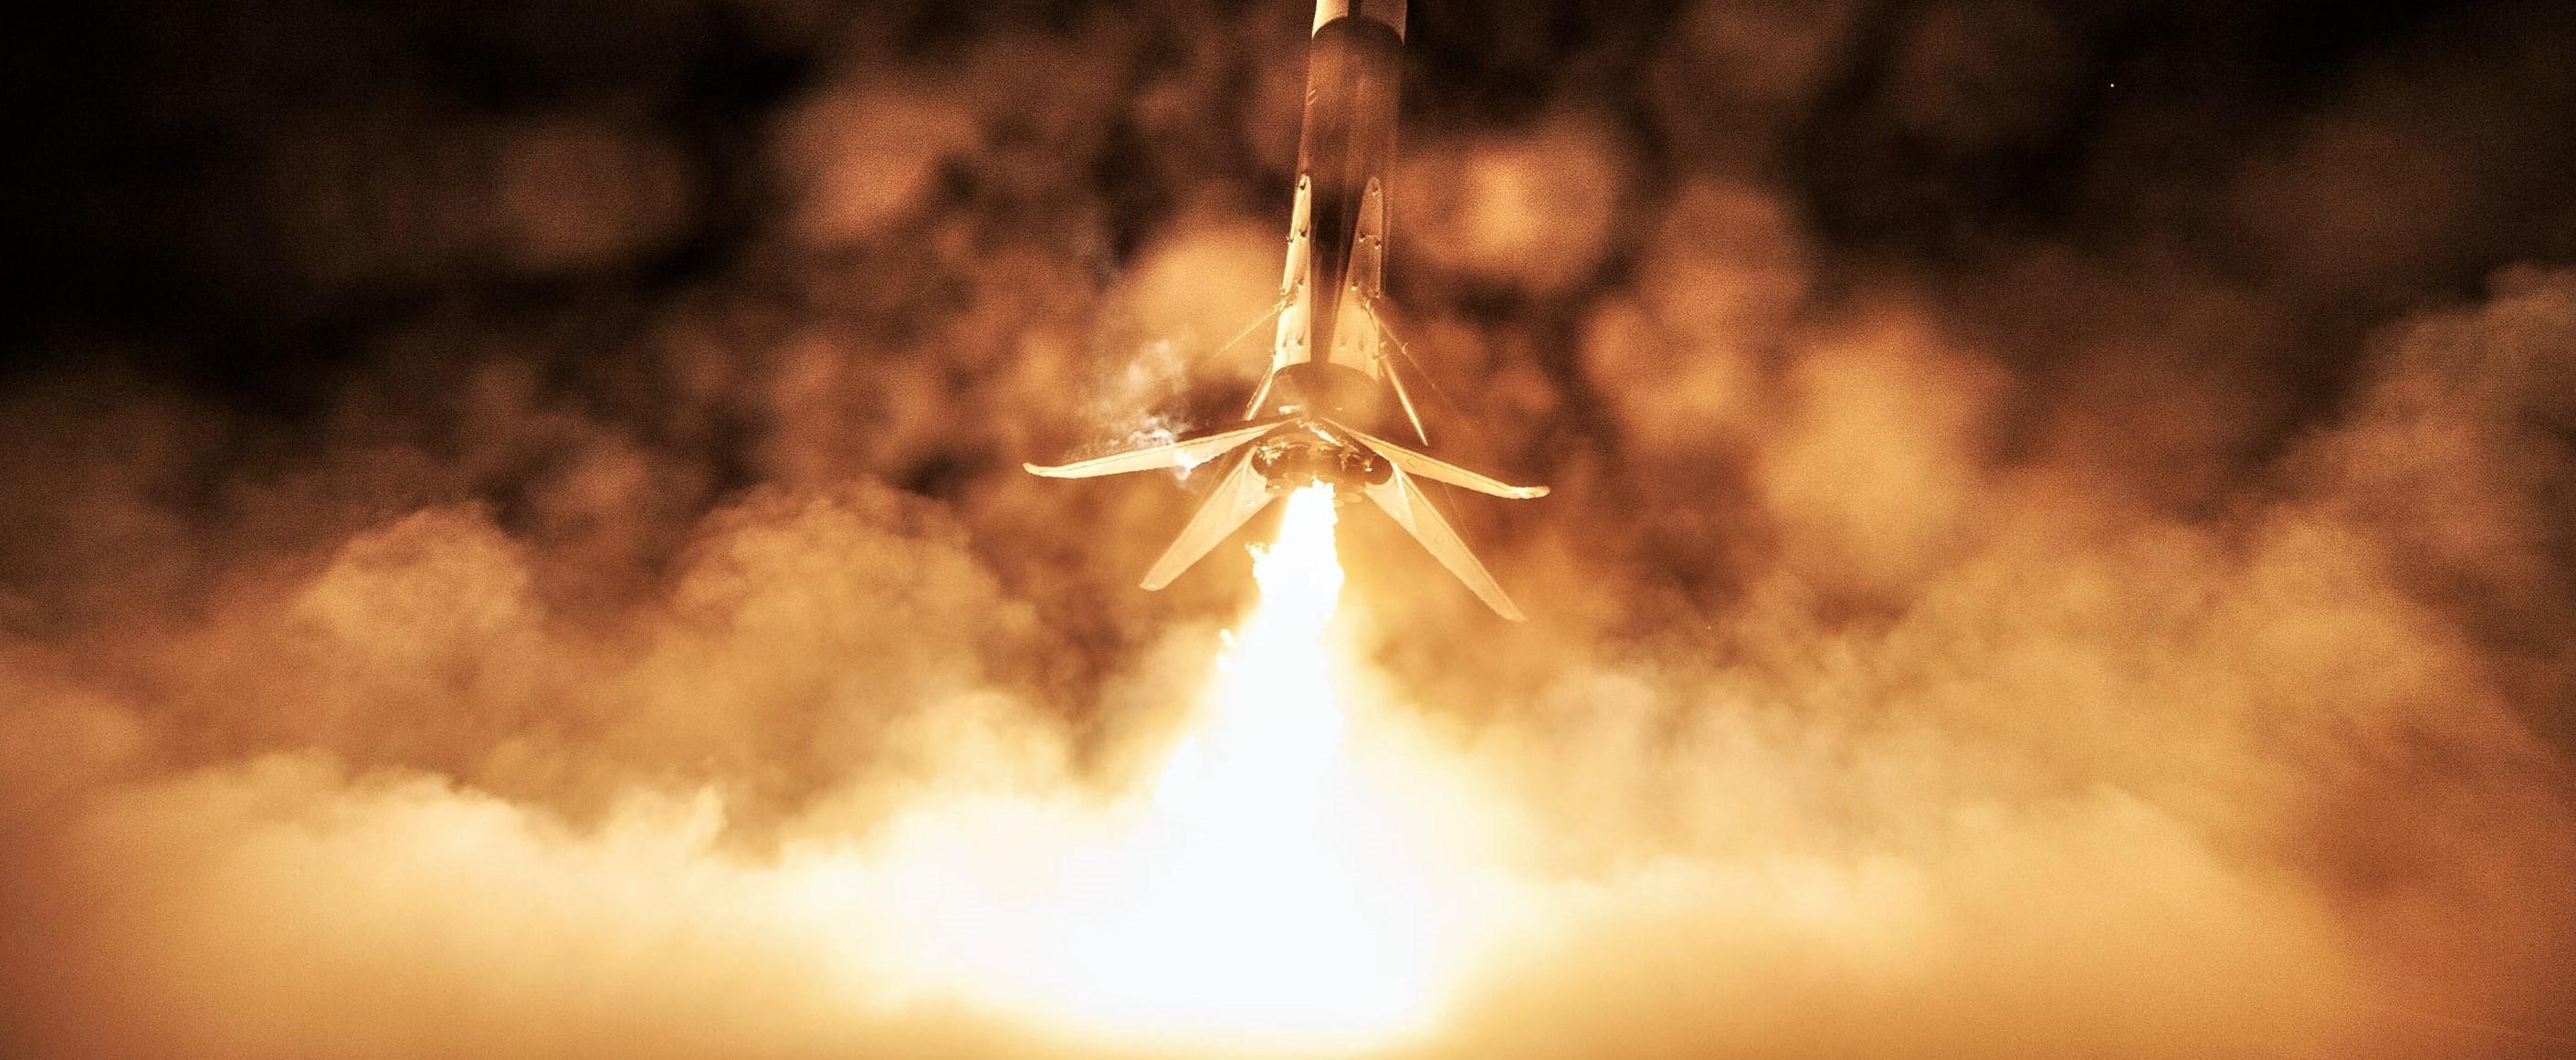 Falcon 9 B1051 DM-1 OCISLY landing (SpaceX) 1 crop